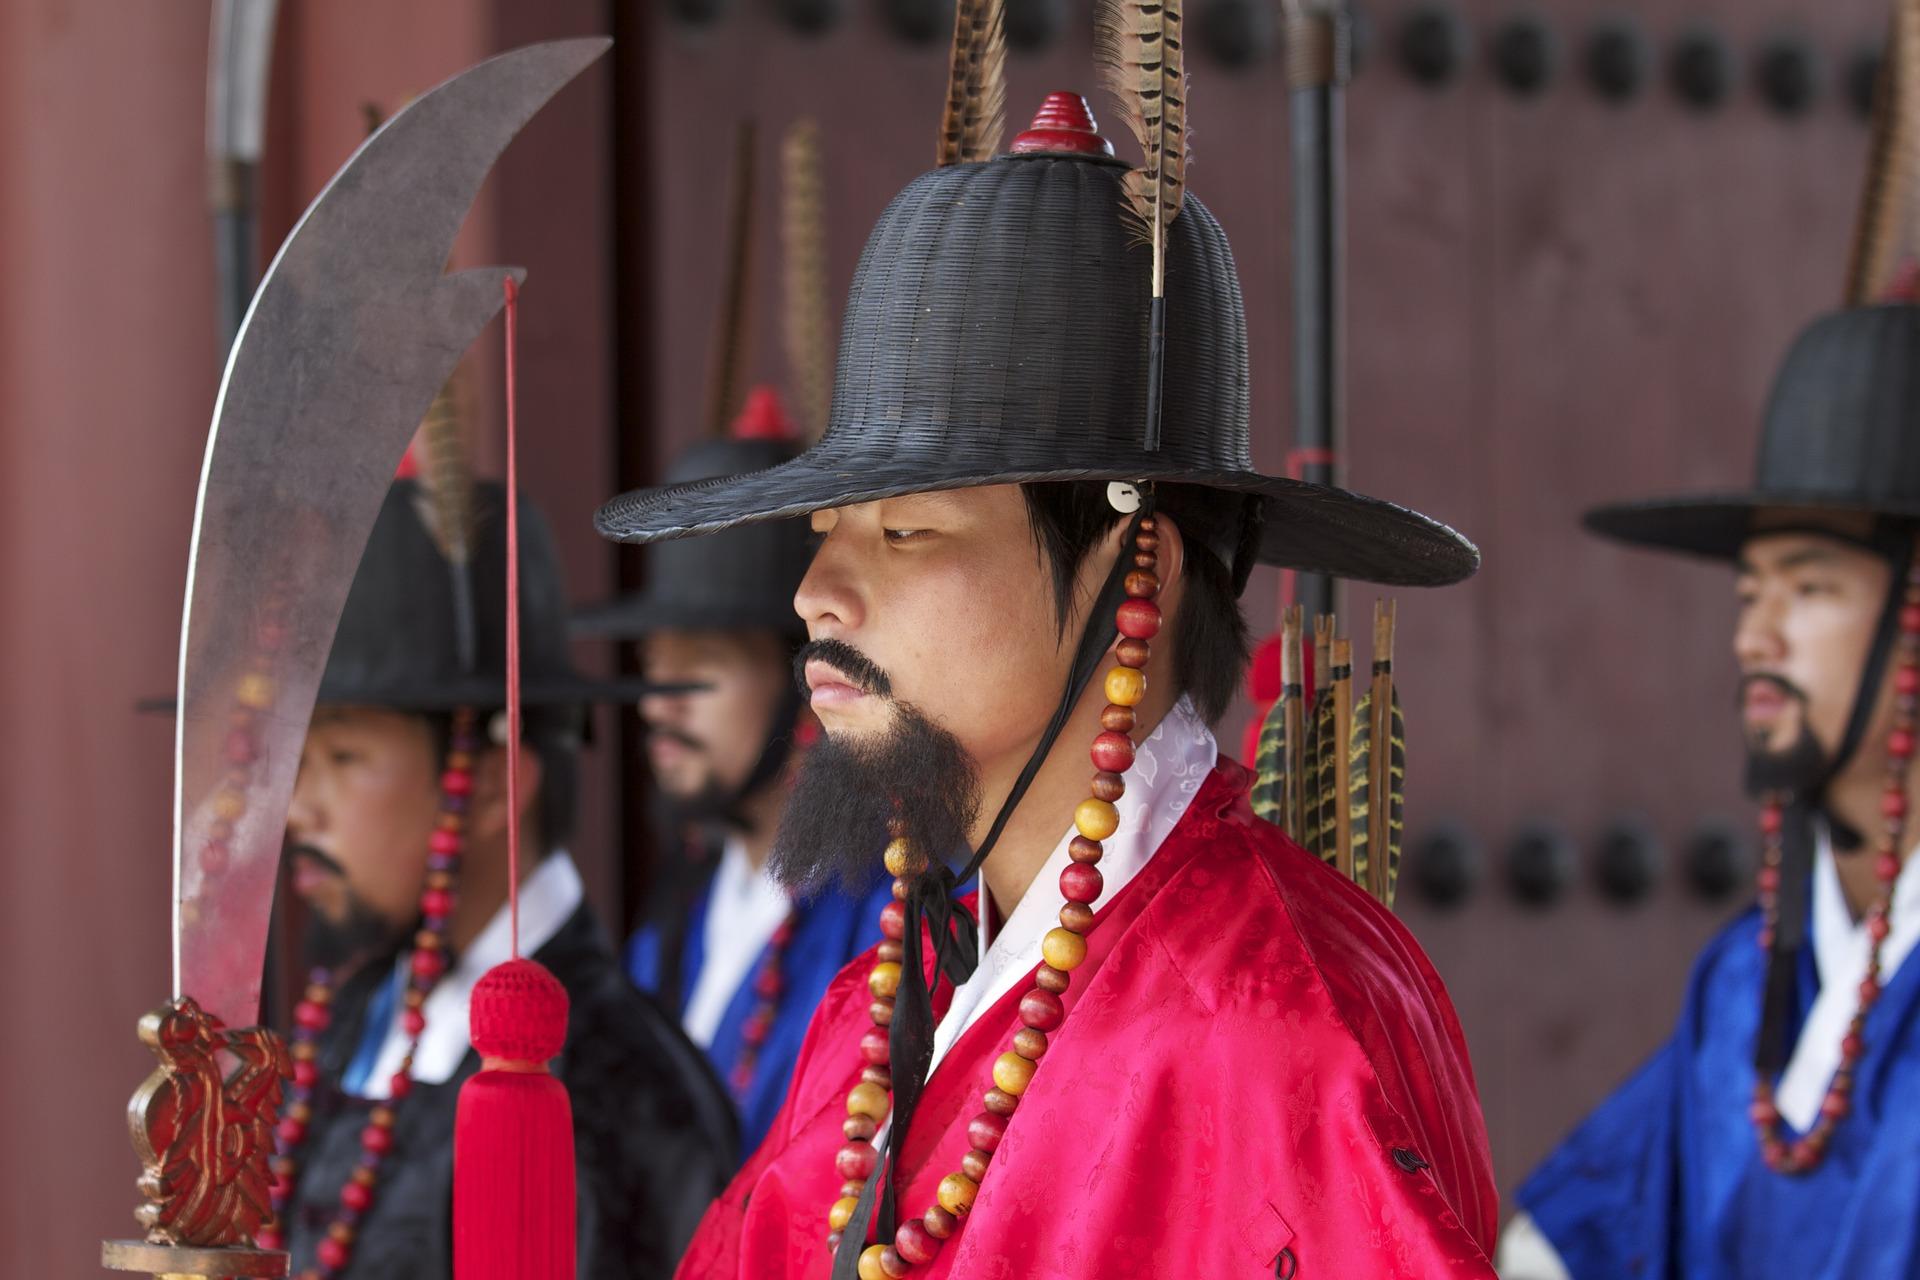 Korea - warta pałacowa